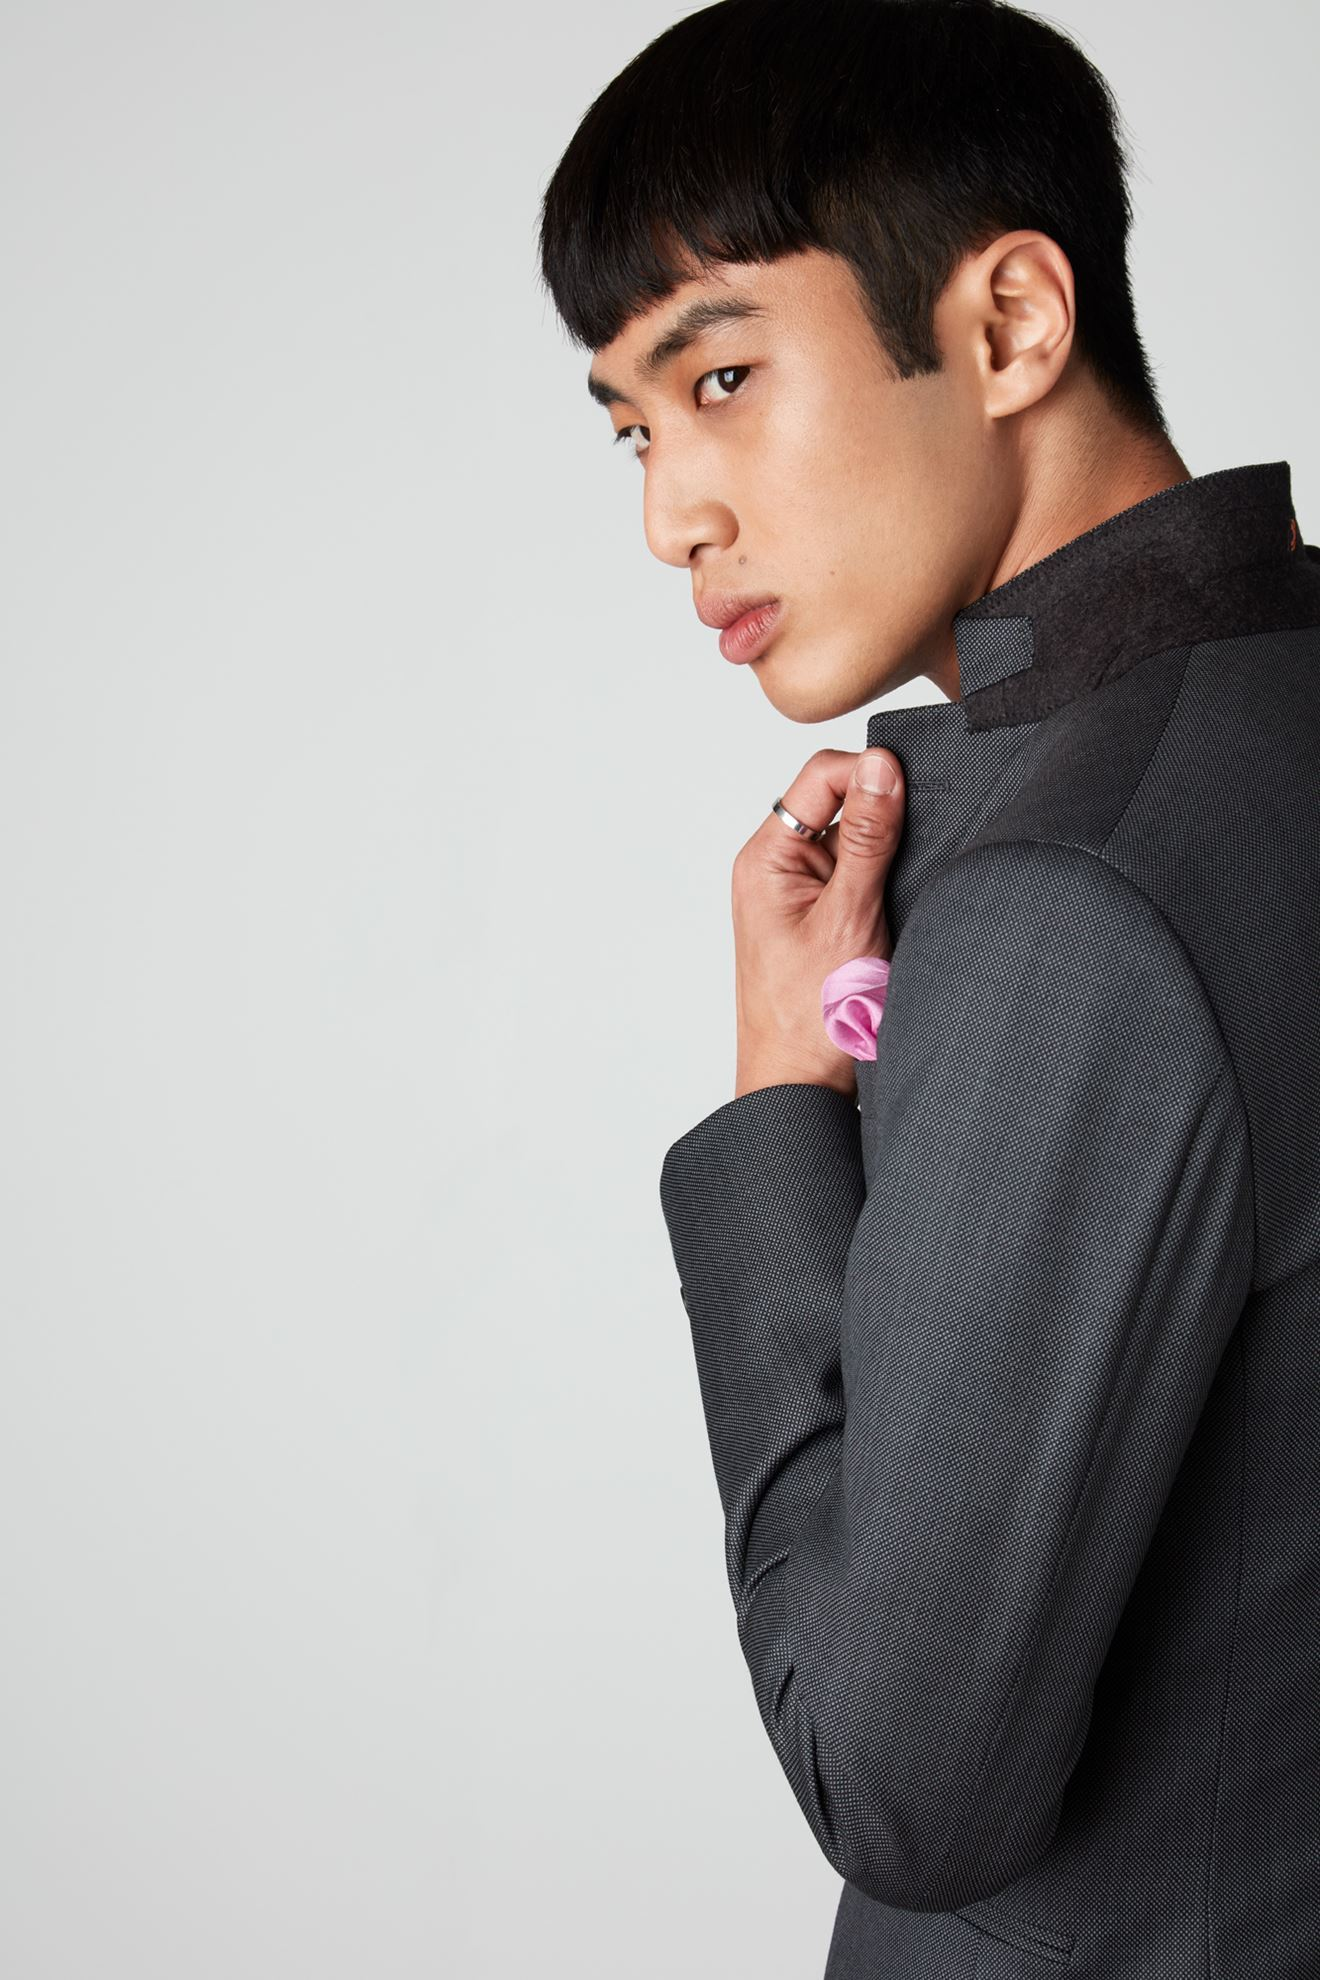 detail shot (collar, pocket square etc) on jacket